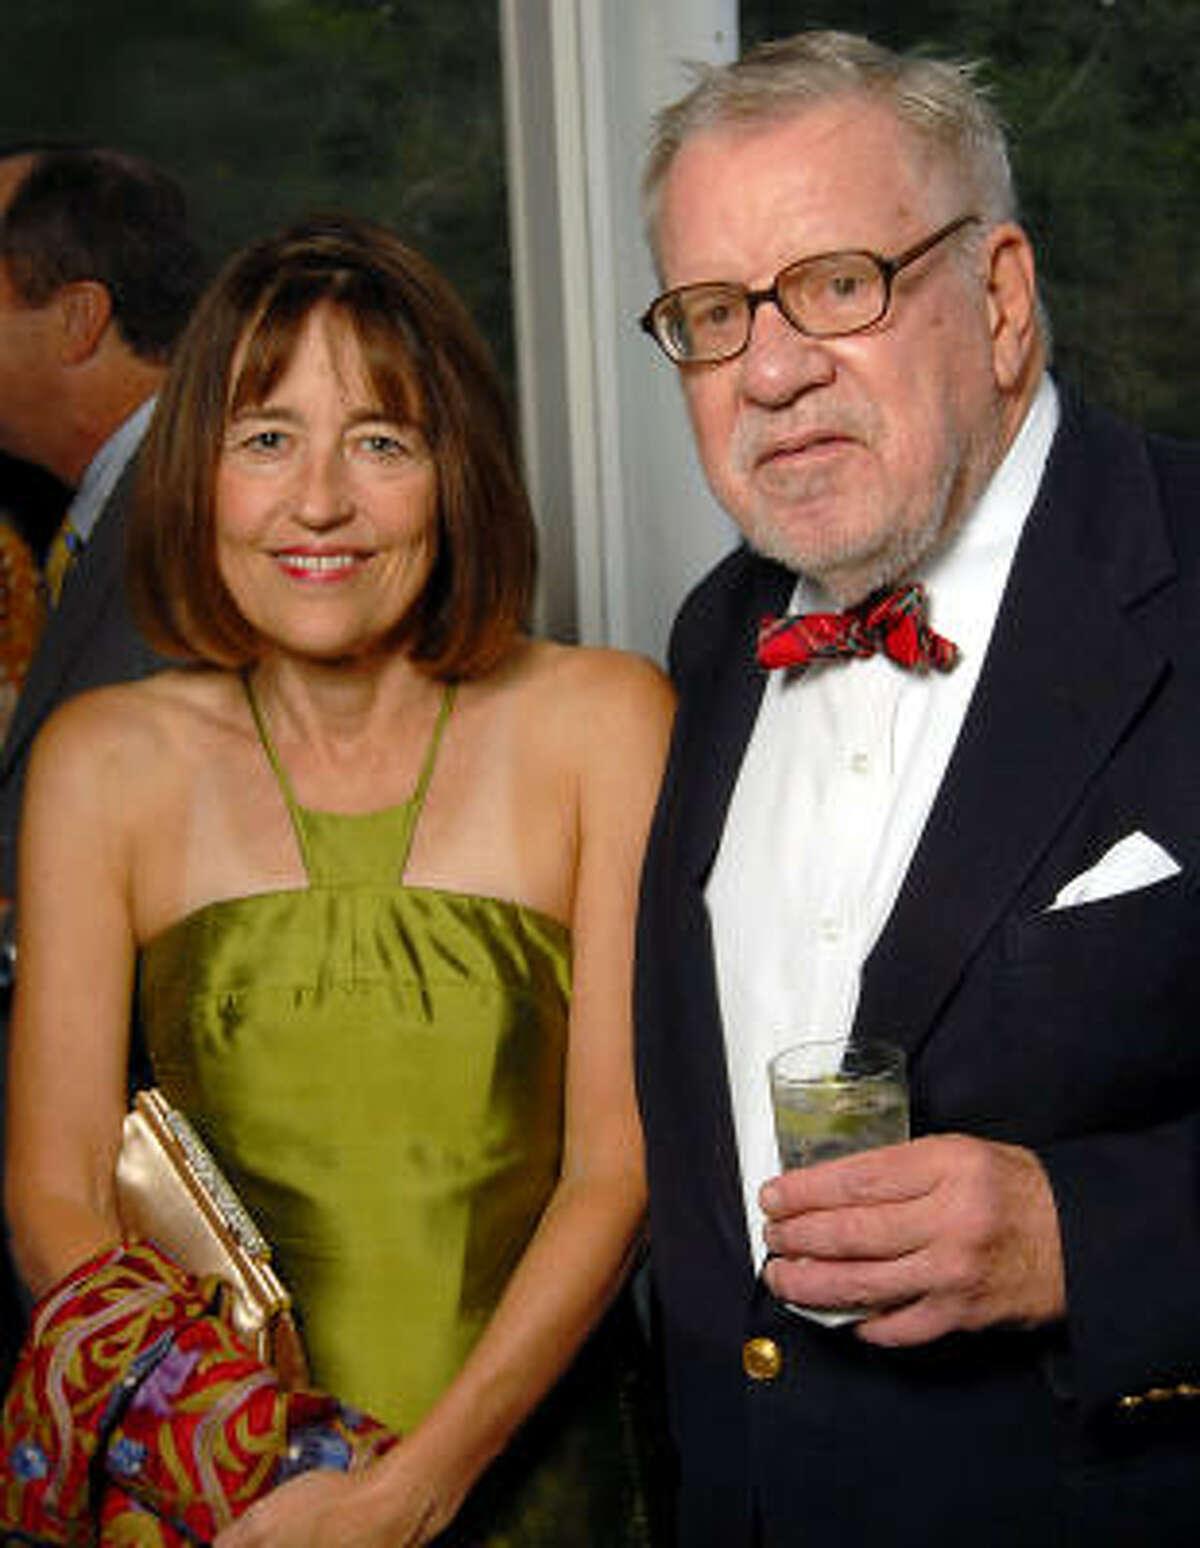 Andrea White and Bill Hobby